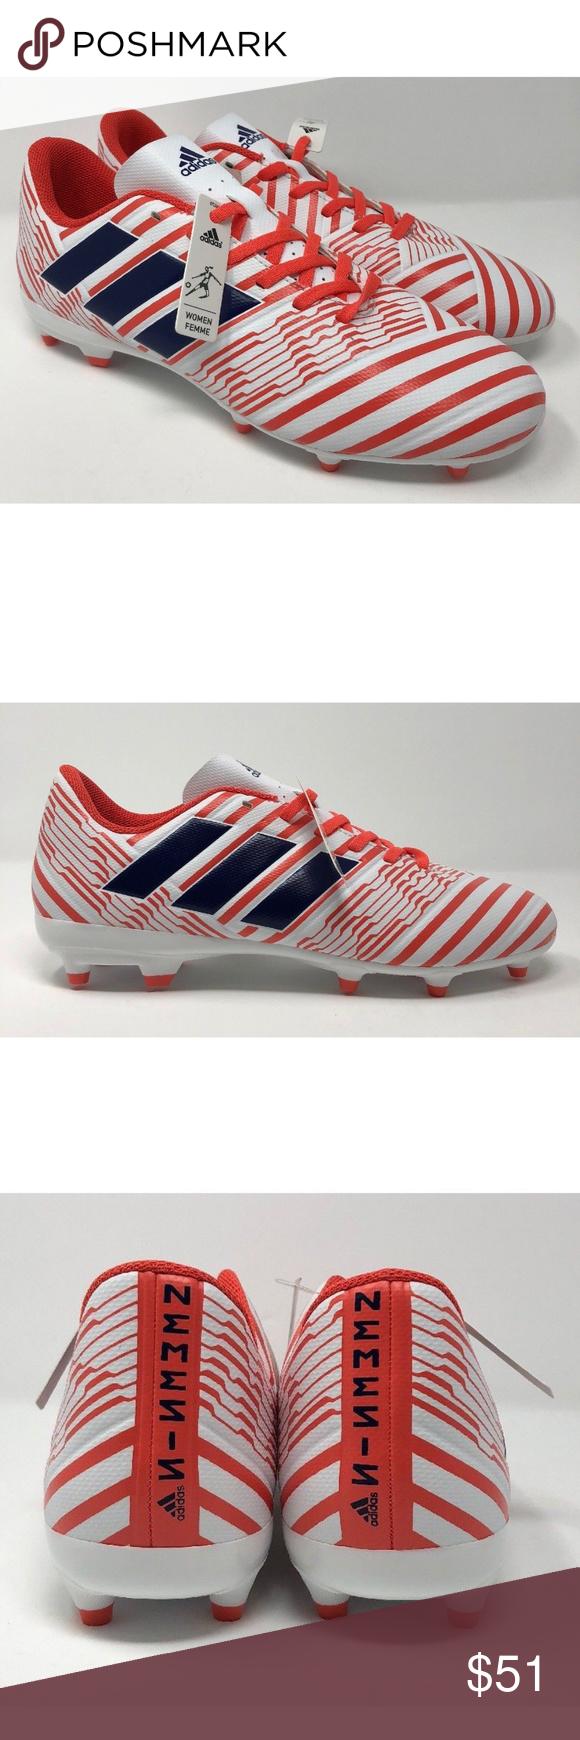 b4ba7b3df Adidas Performance Nemeziz 17.4 FG White SZ 9 Adidas Performance (BY8886) Nemeziz  17.4 FG White Soccer Cleats Women's SZ 9. adidas Shoes